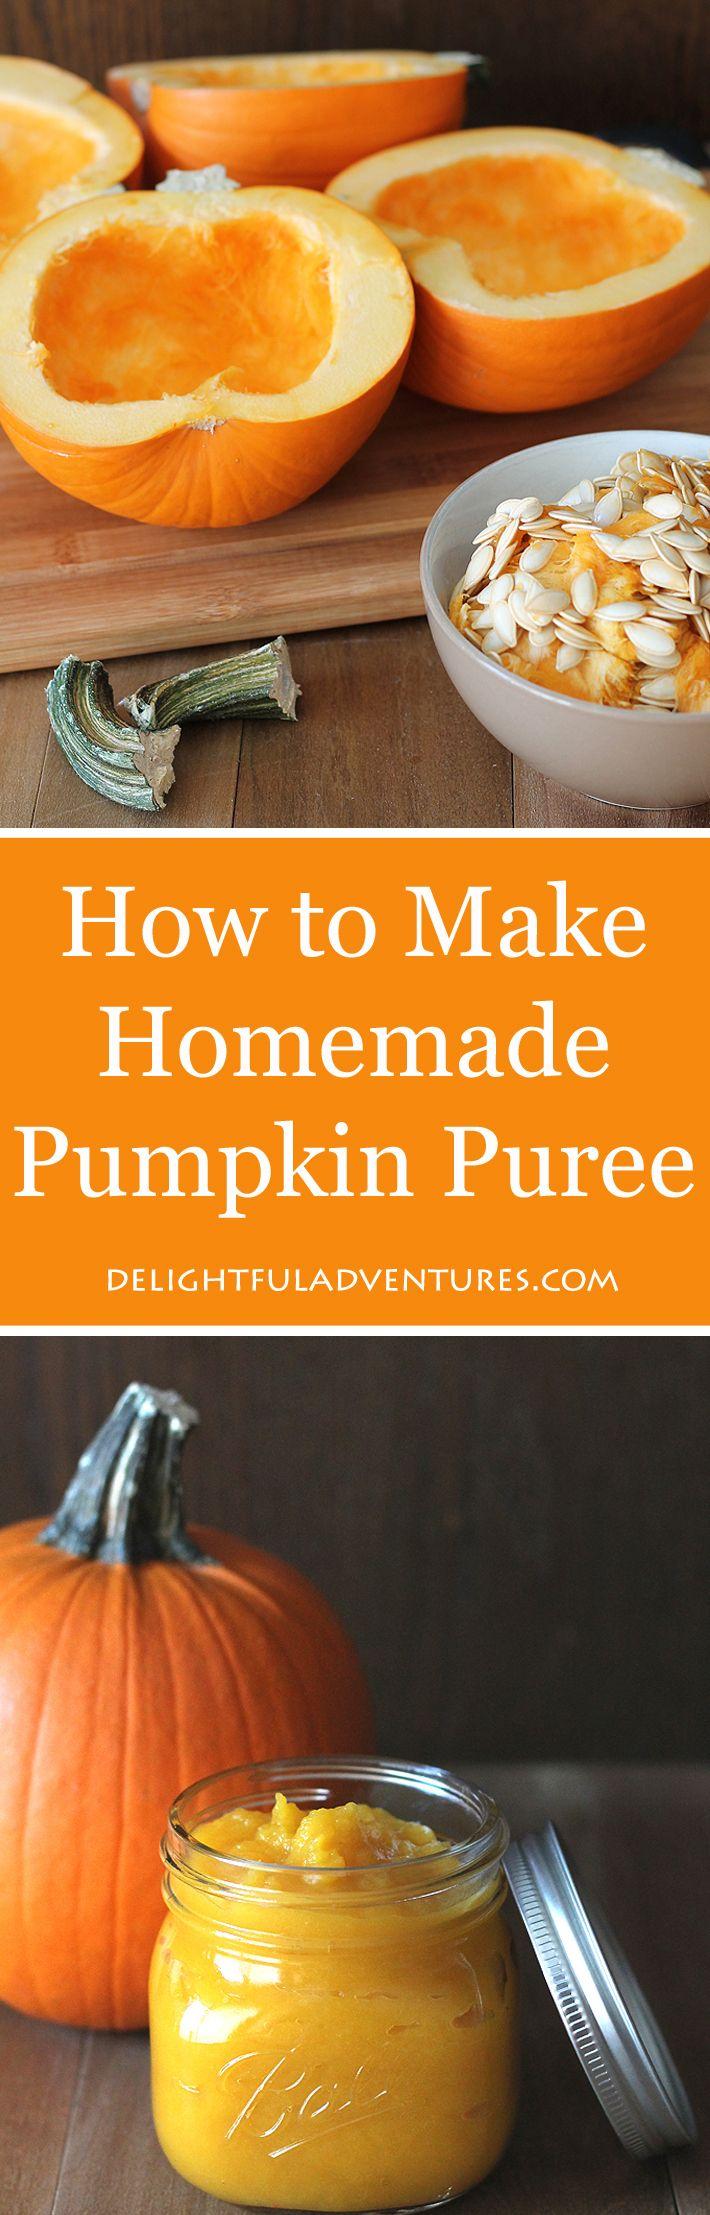 How to Make Homemade Pumpkin Puree (It's easy!)